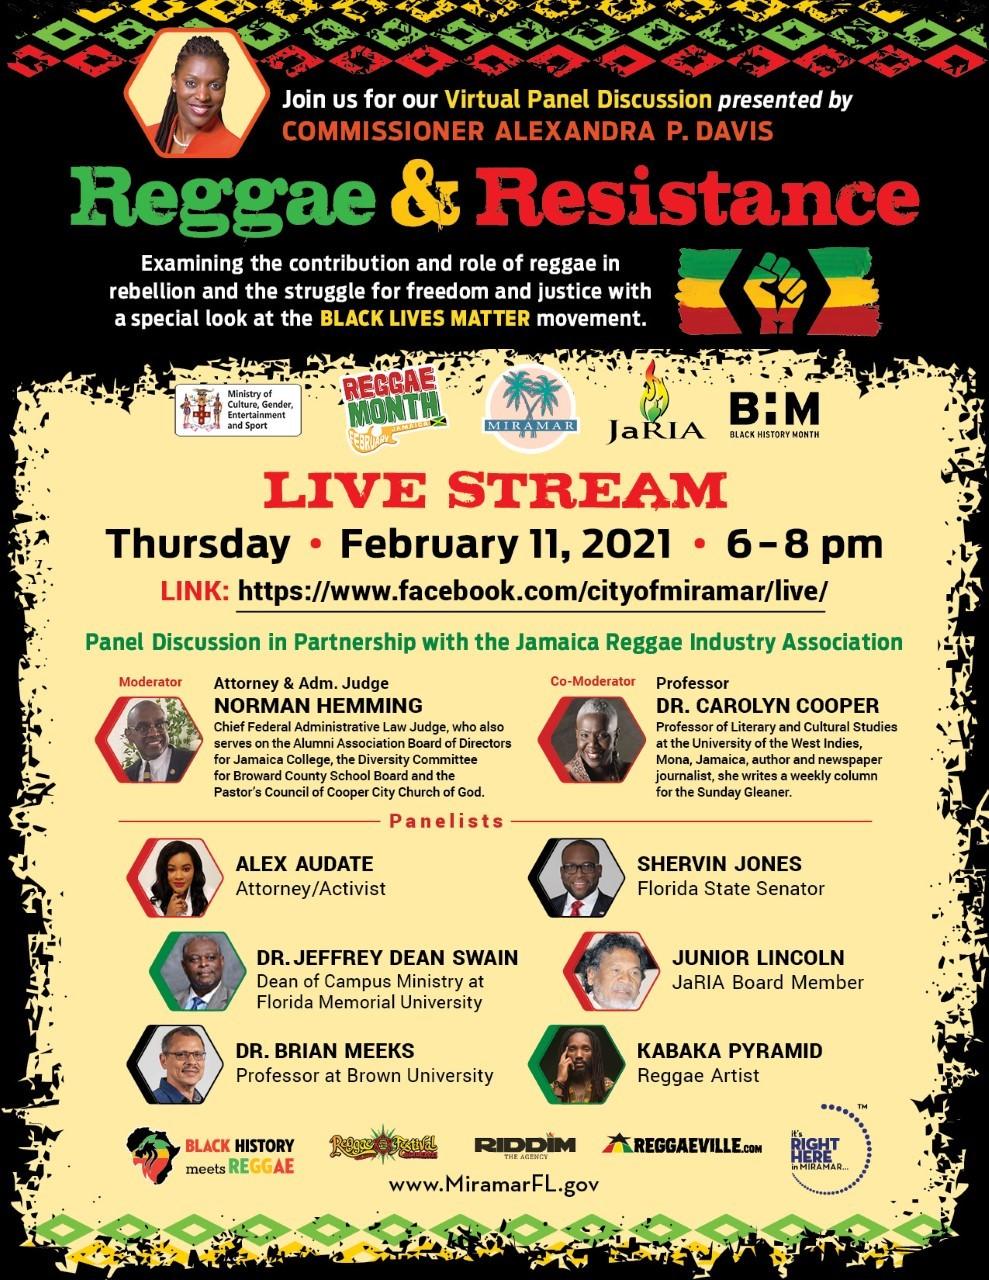 Commissioner Davis Reggae and Resistance FNL